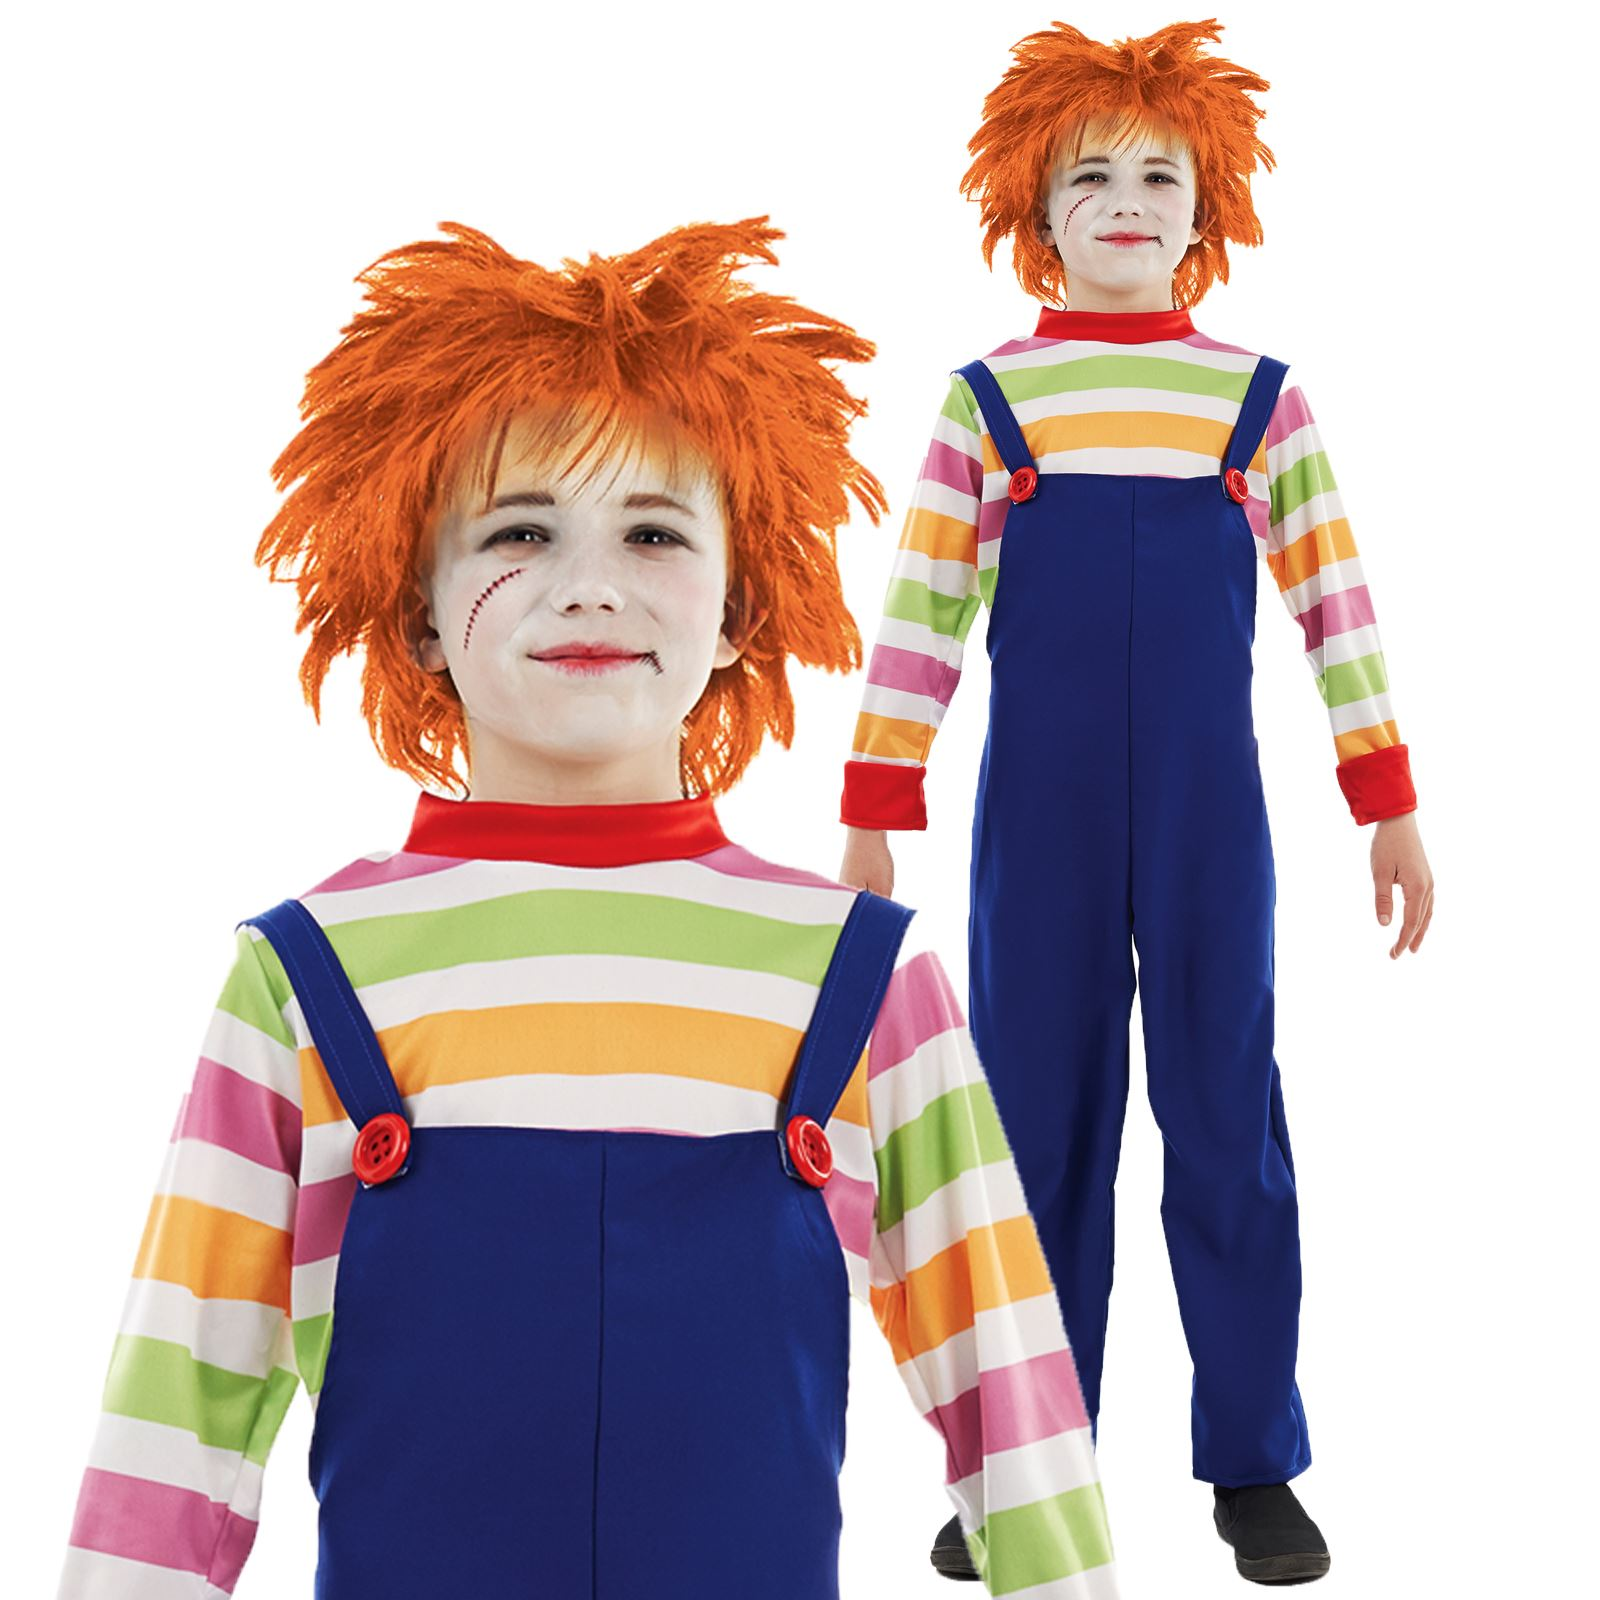 KIDS CHILDS PLAY EVIL DOLL CHUCKY MOVIE HALLOWEEN FANCY DRESS ...